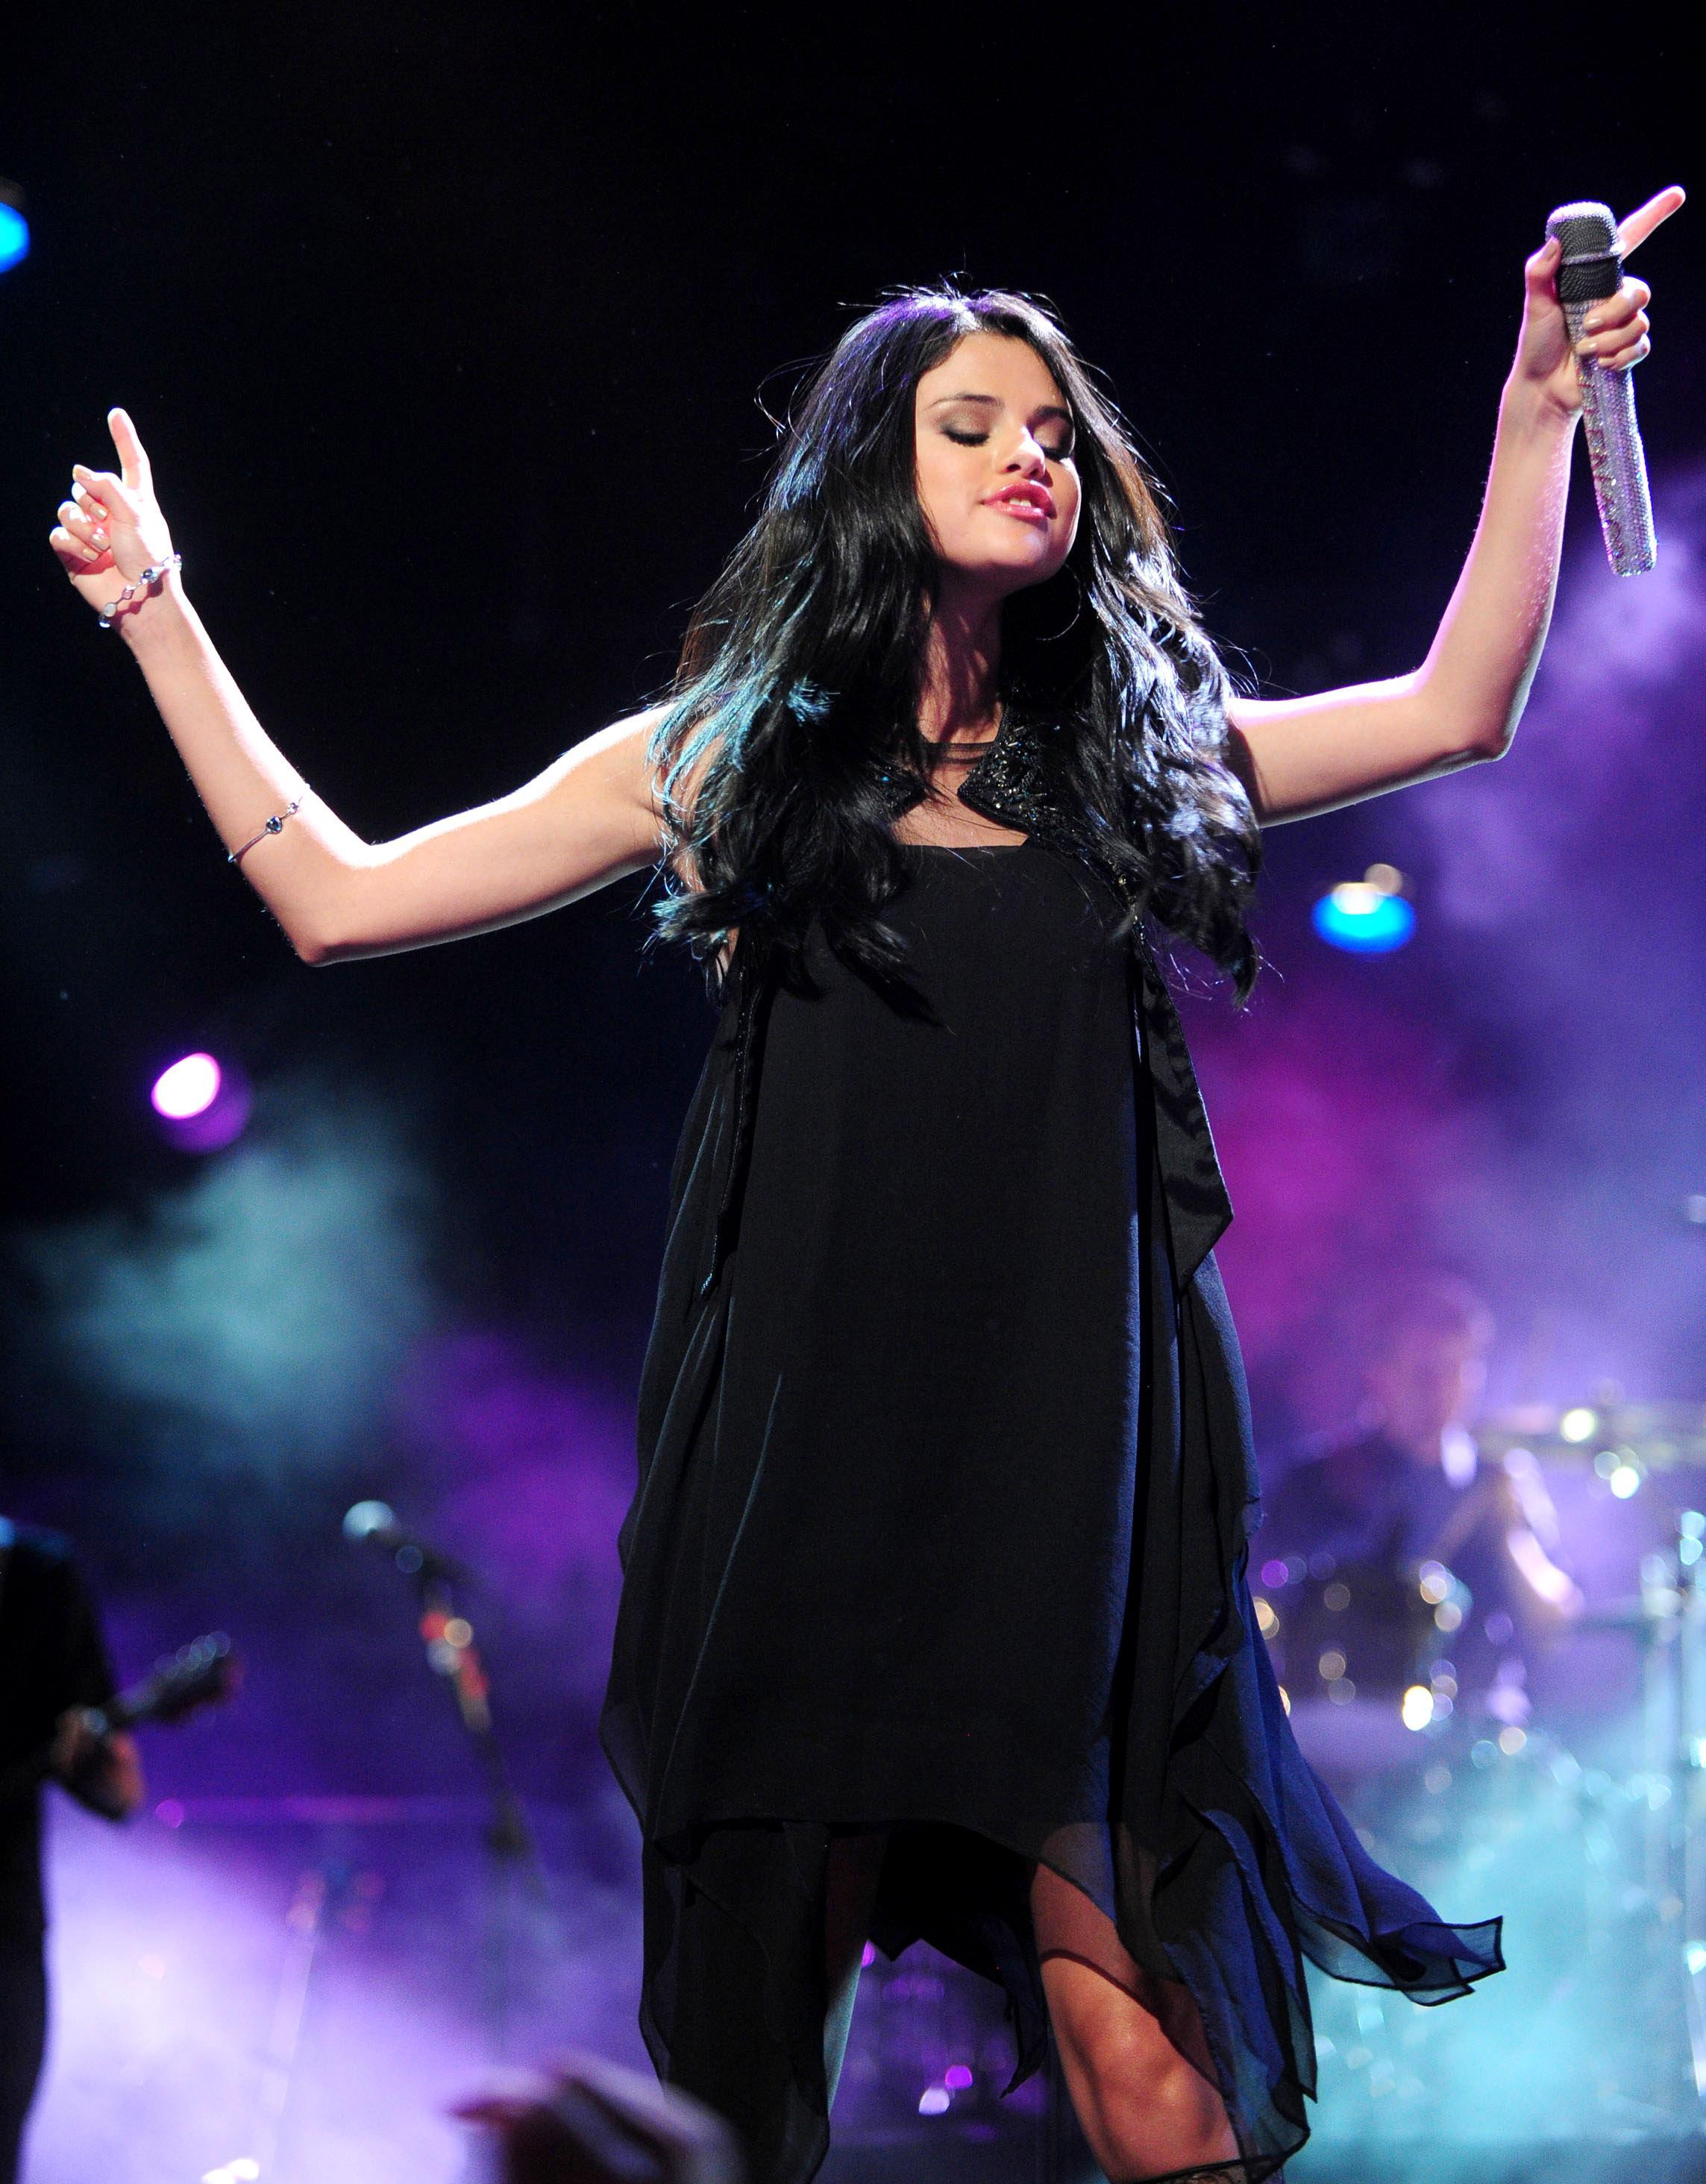 Фото платье на концерт 4